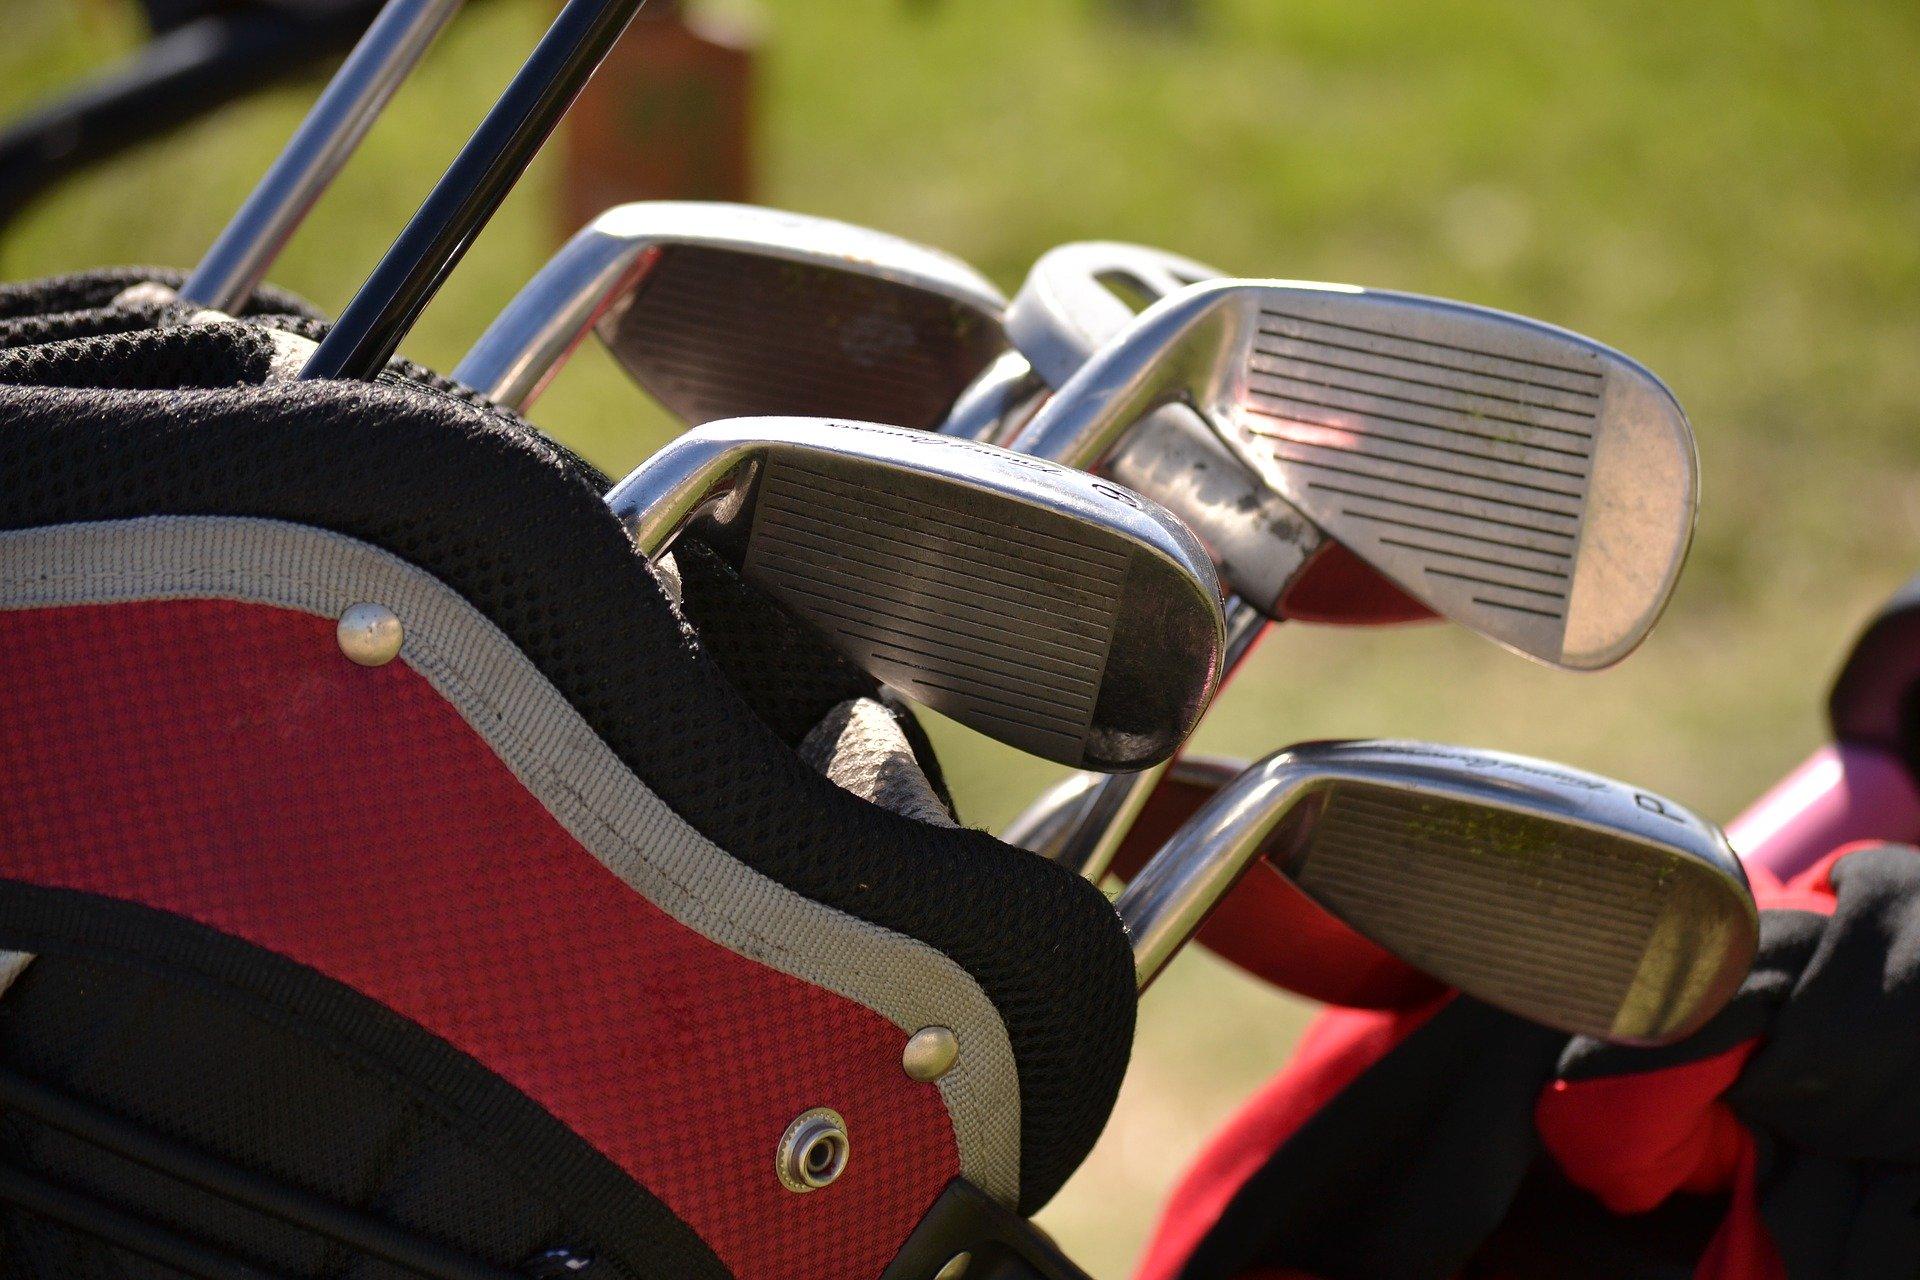 caracteristicas bolsas palos de golf